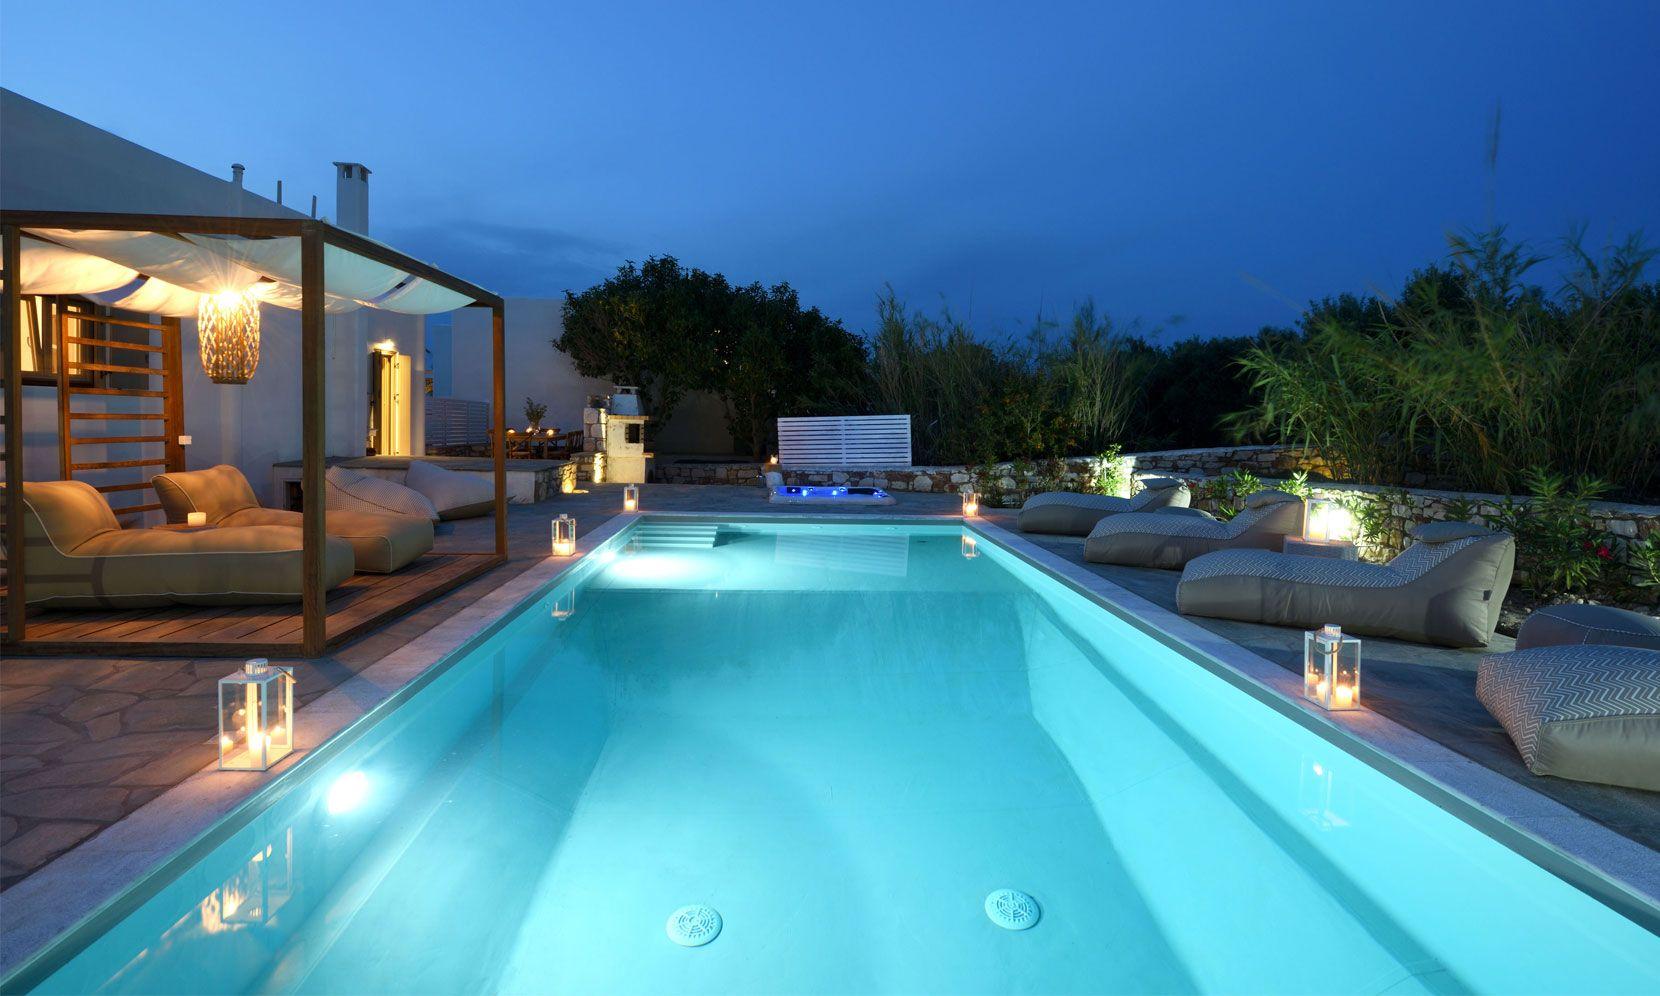 Paros Villa Dafne jumbotron image